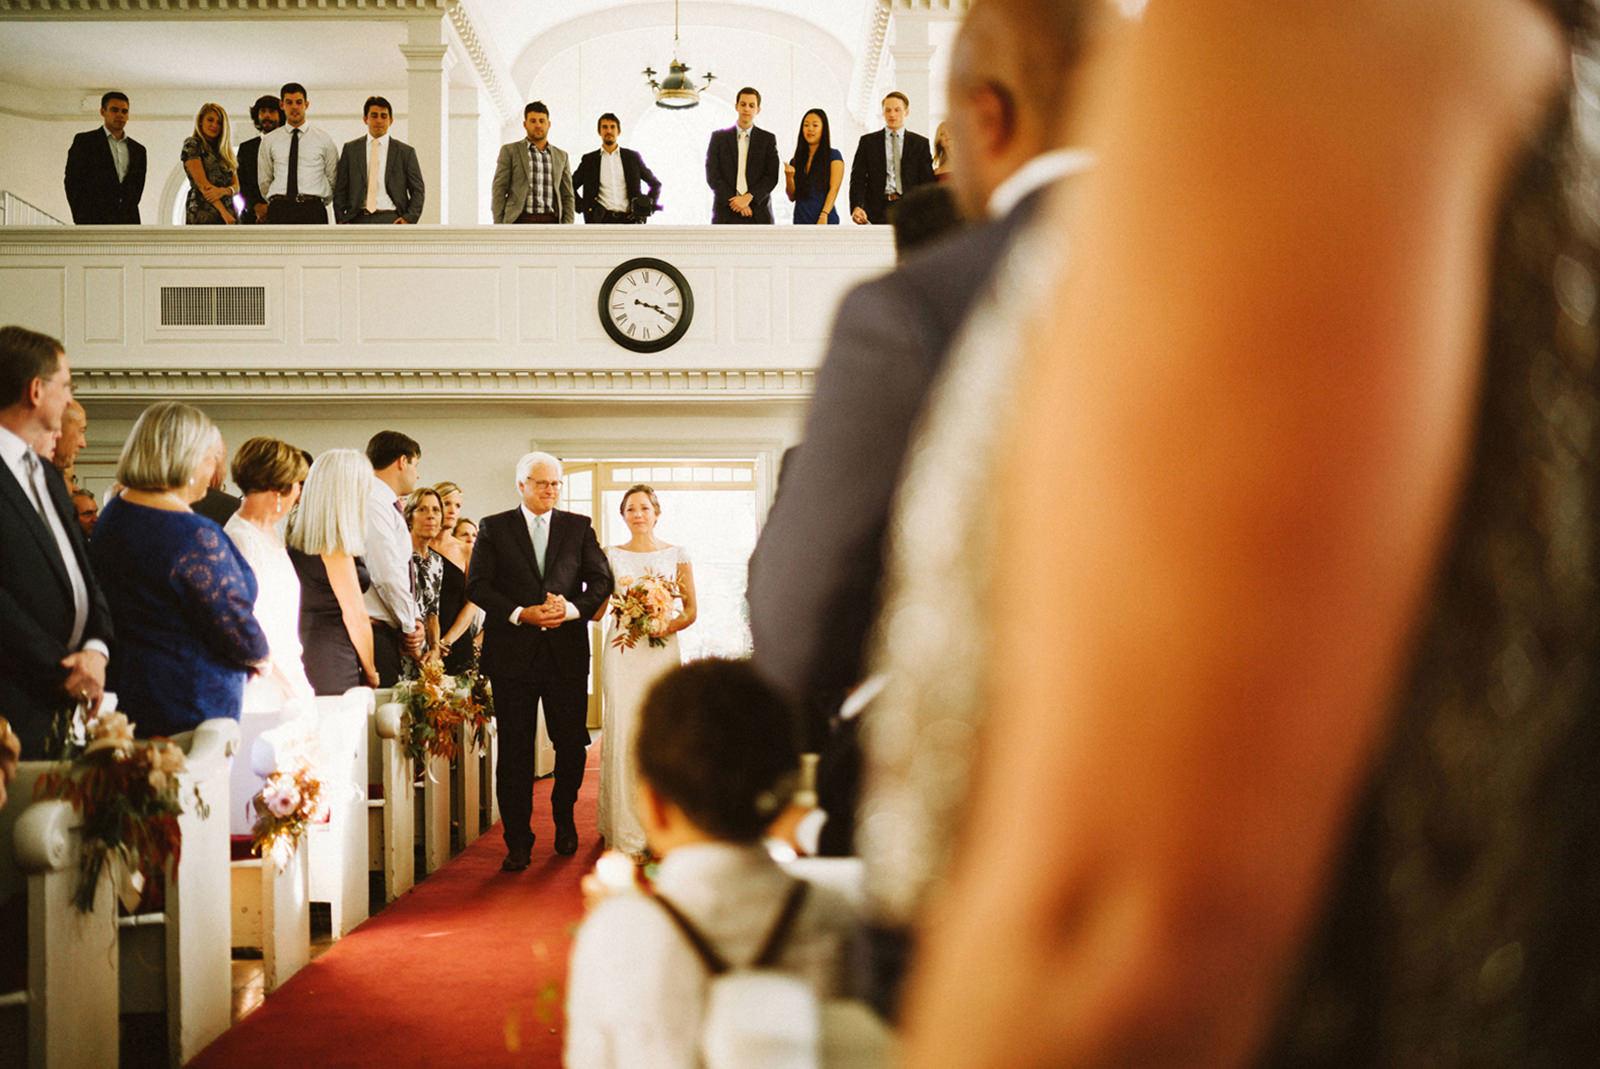 bridgeport-wedding-047 BRIDGEPORT, CONNECTICUT BACKYARD WEDDING